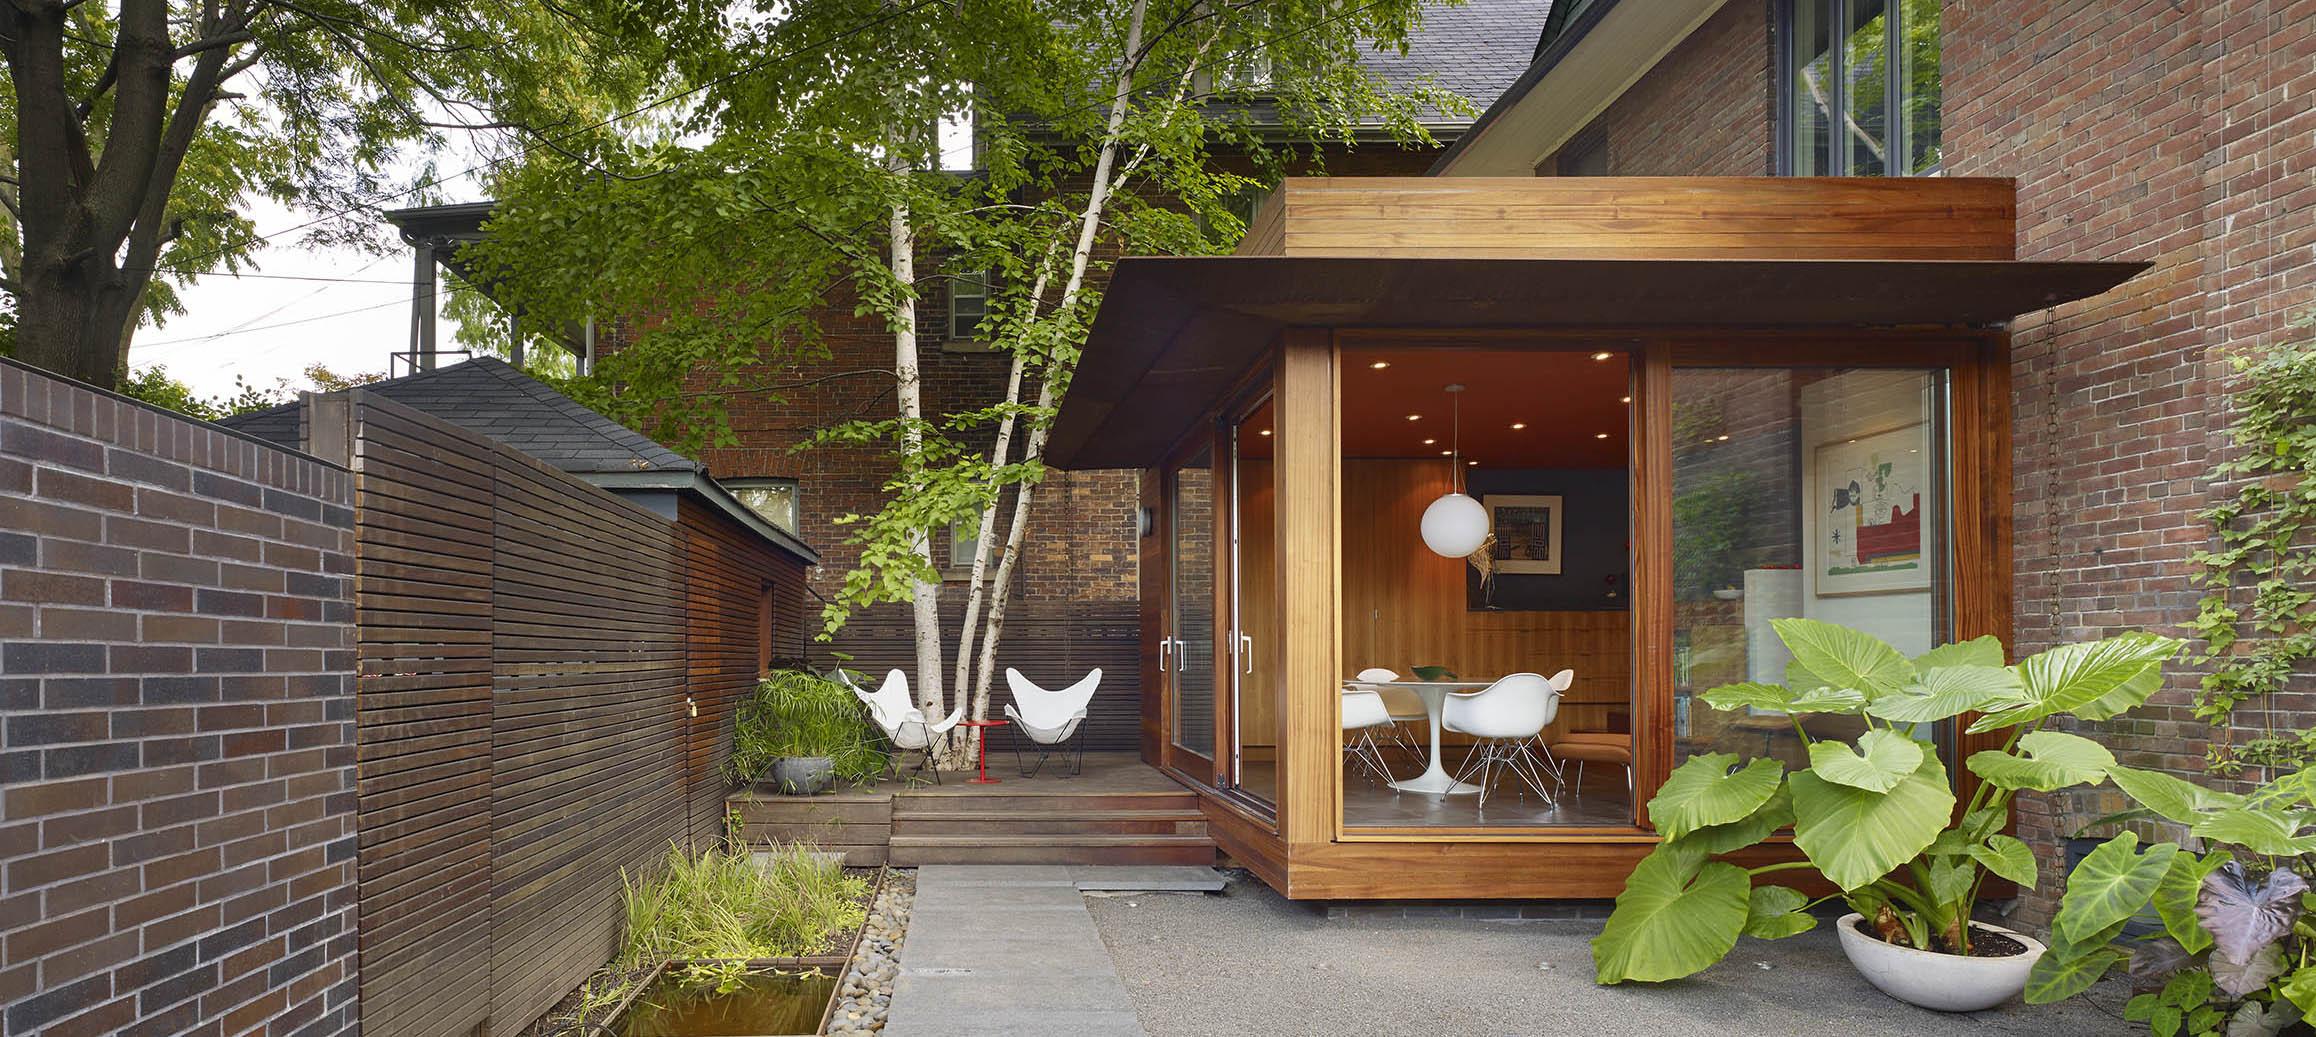 Delaware House | Jennifer Turner Architect